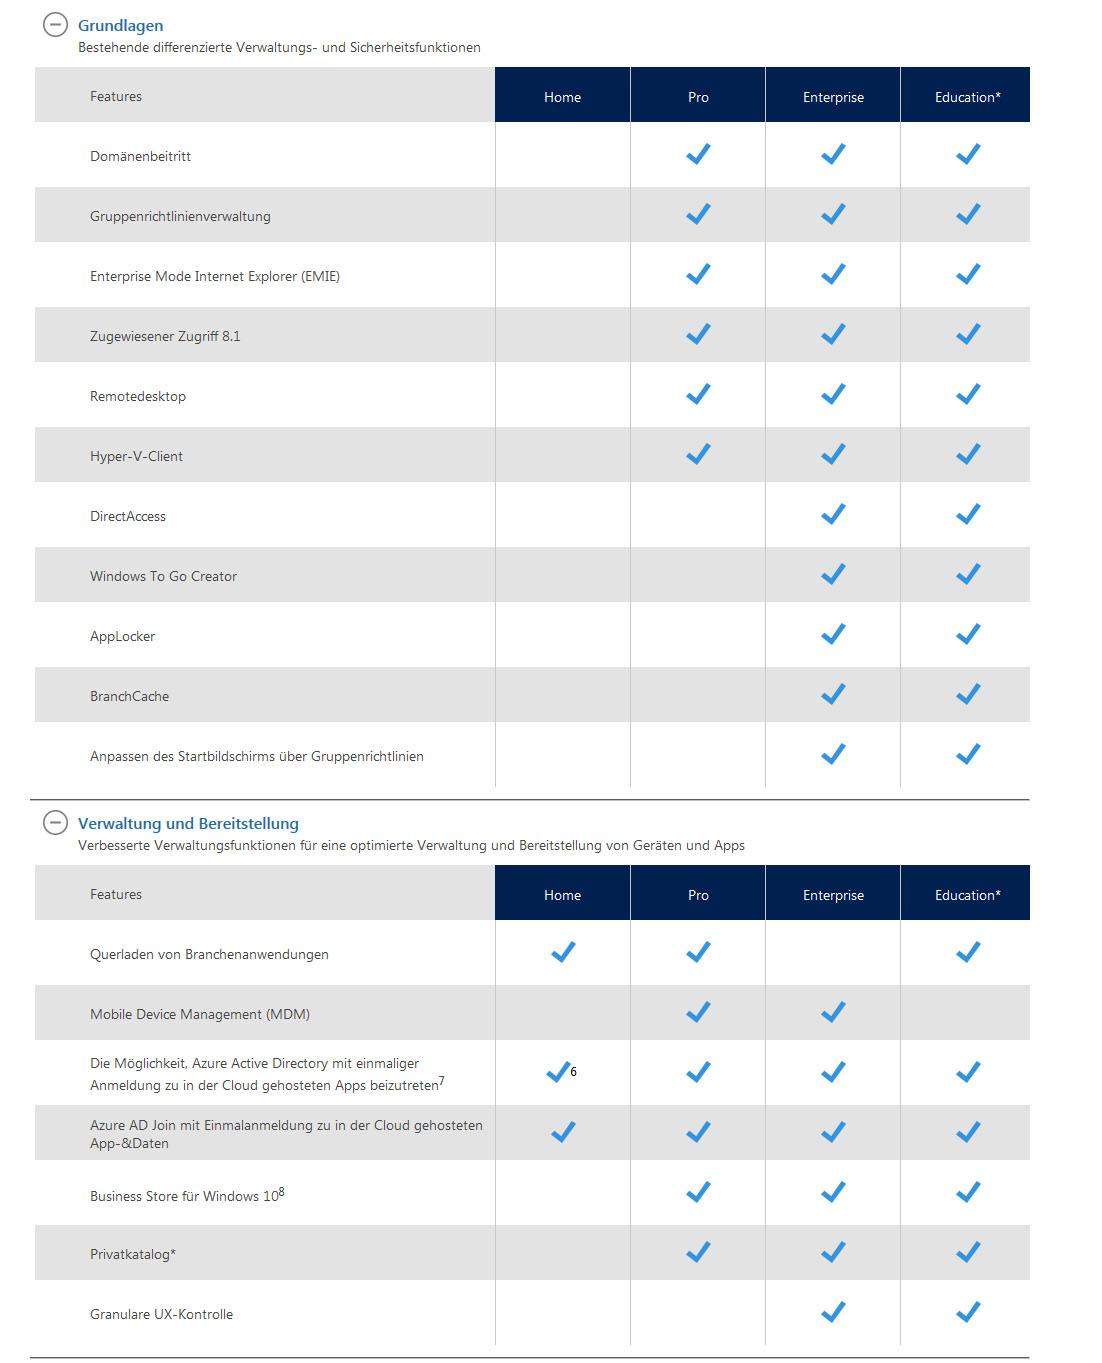 microsoft windows 10 pro or enterprise